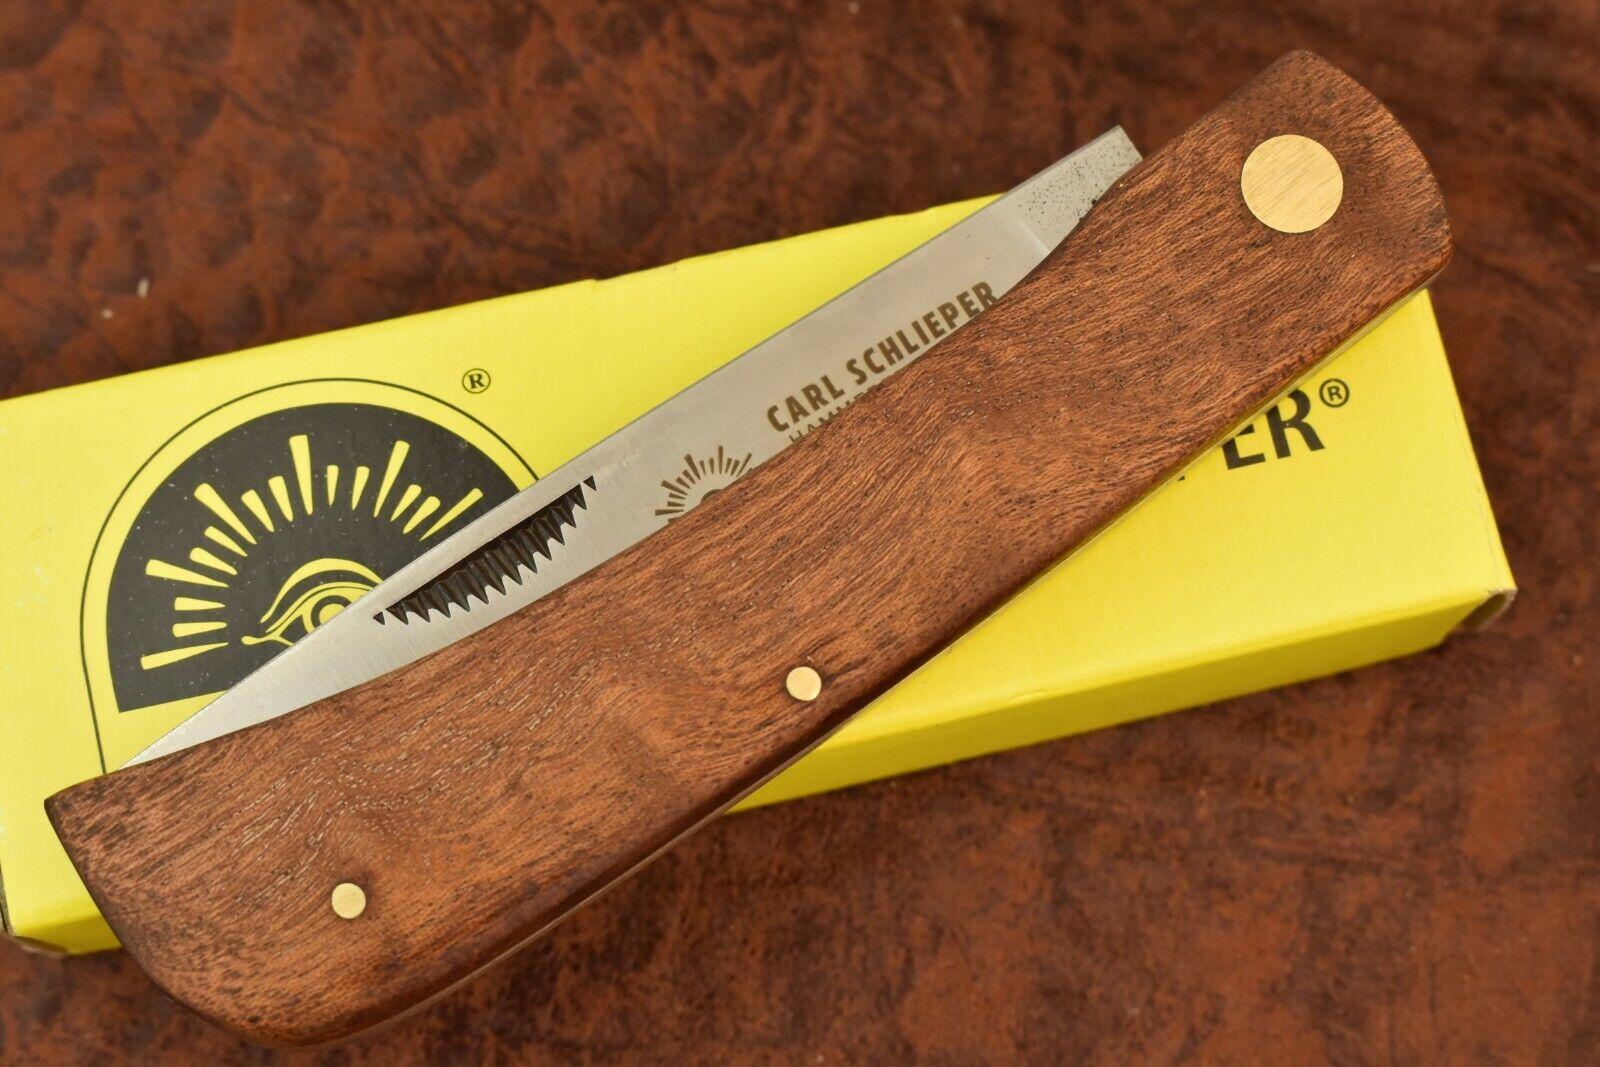 GERMAN EYE BRAND CARL SCHLIEPER JUMBO WOOD SODBUSTER KNIFE SOLINGEN GERMANY 9558